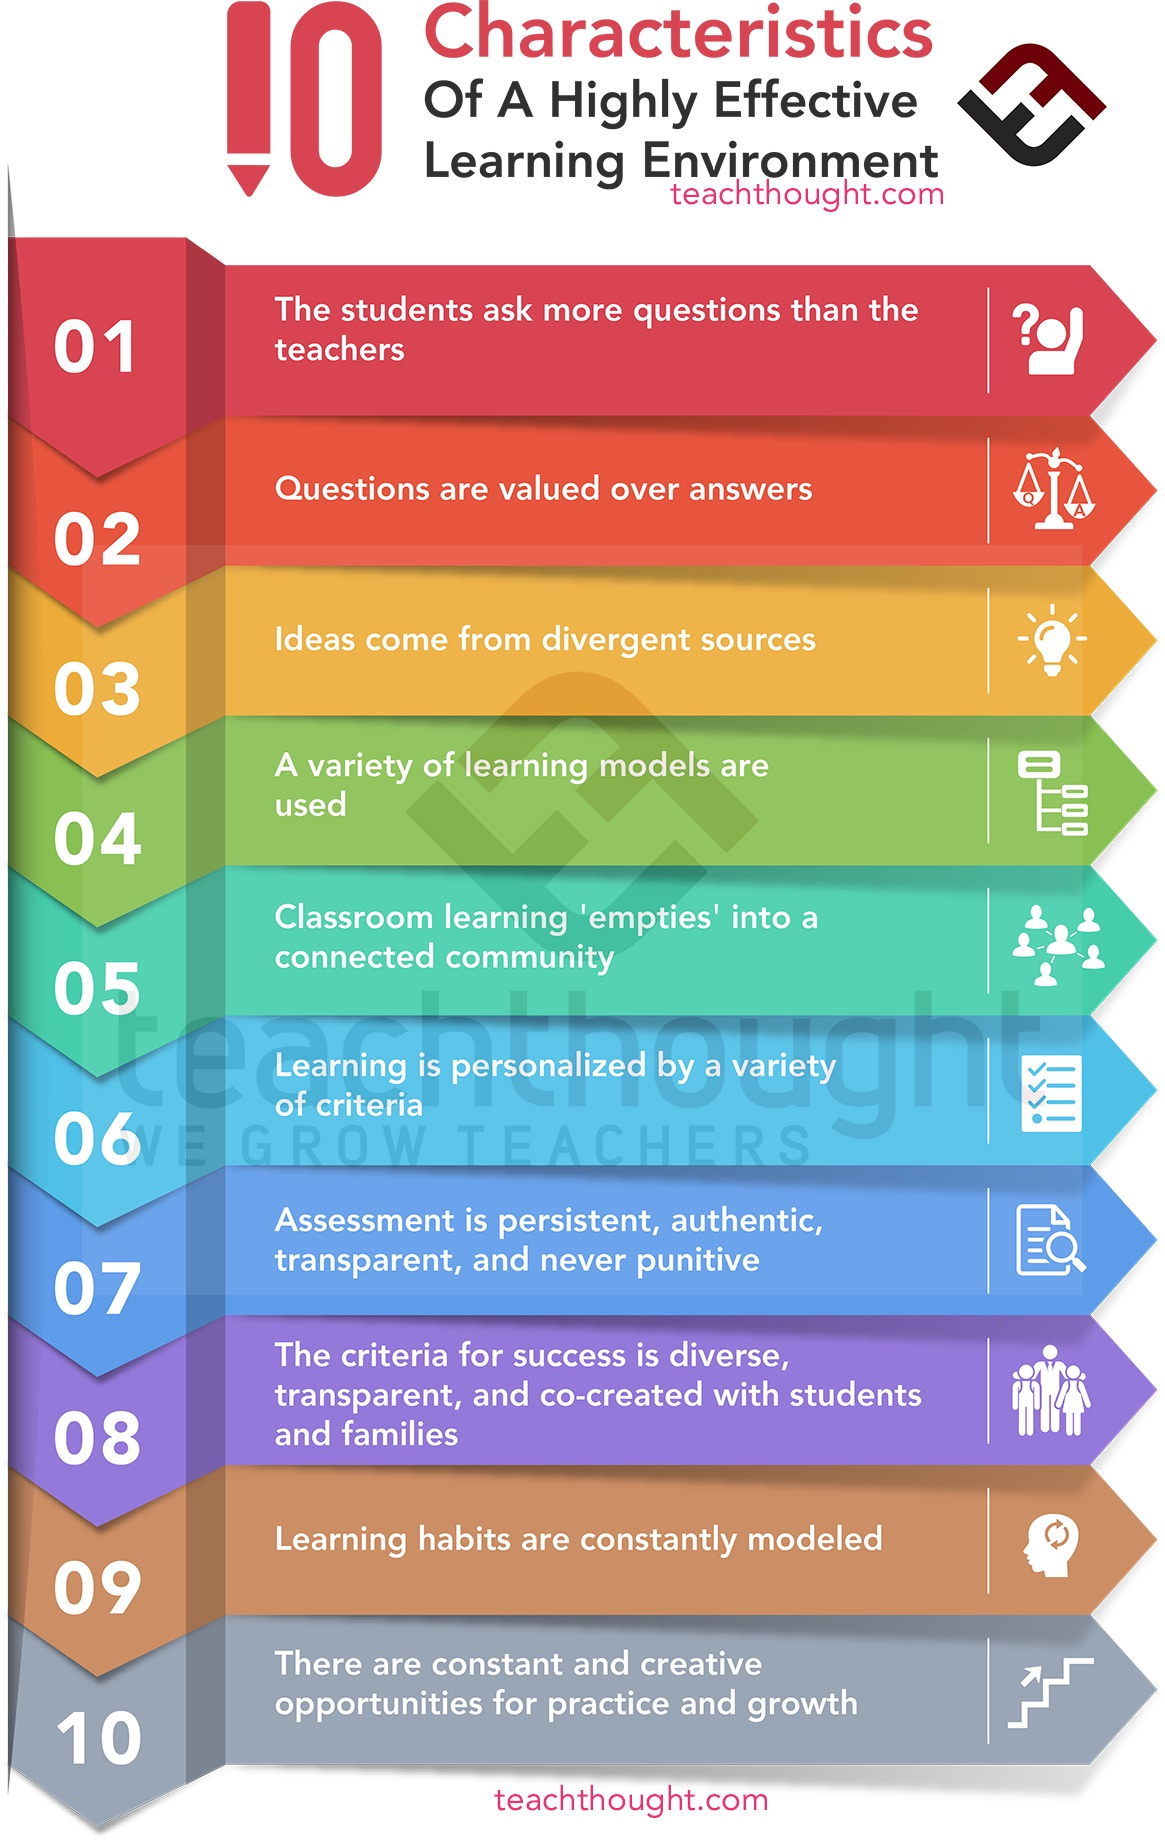 10 Characteristics